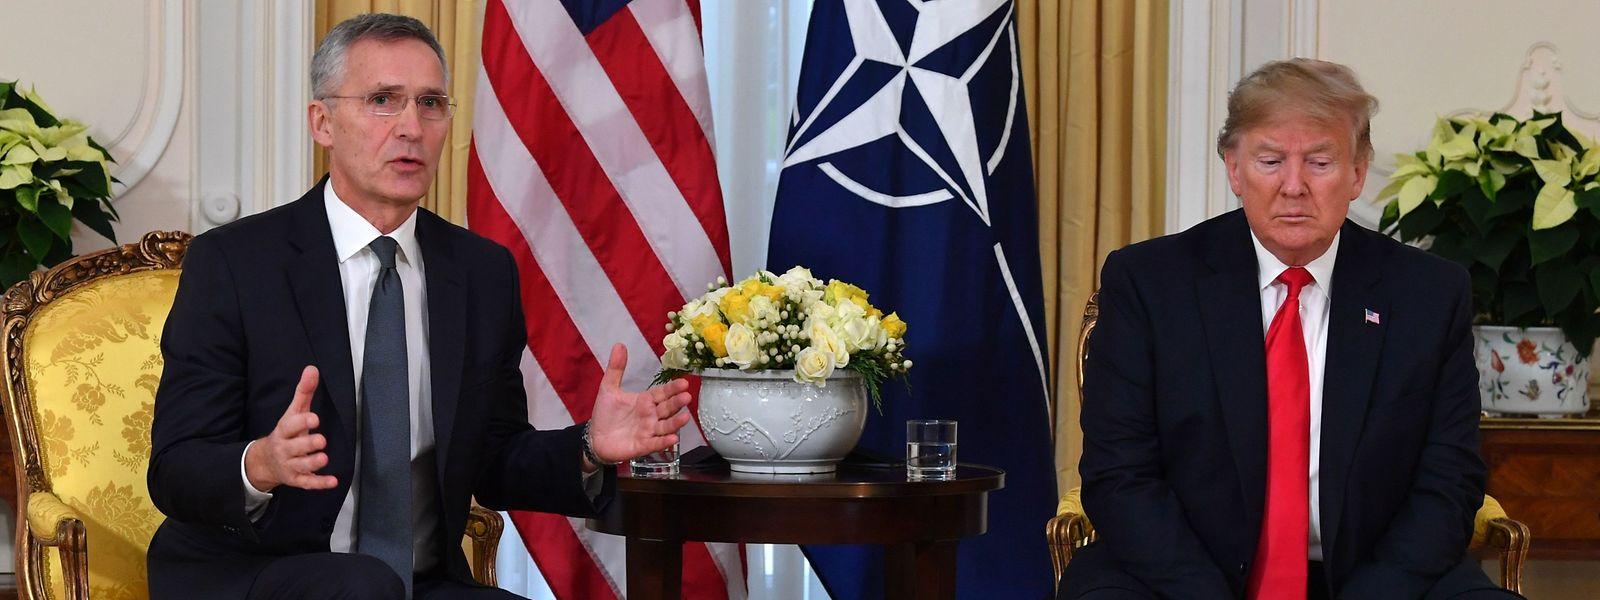 Nato-Generalsekretär Jens Stoltenberg und US-Präsident Donald Trump.